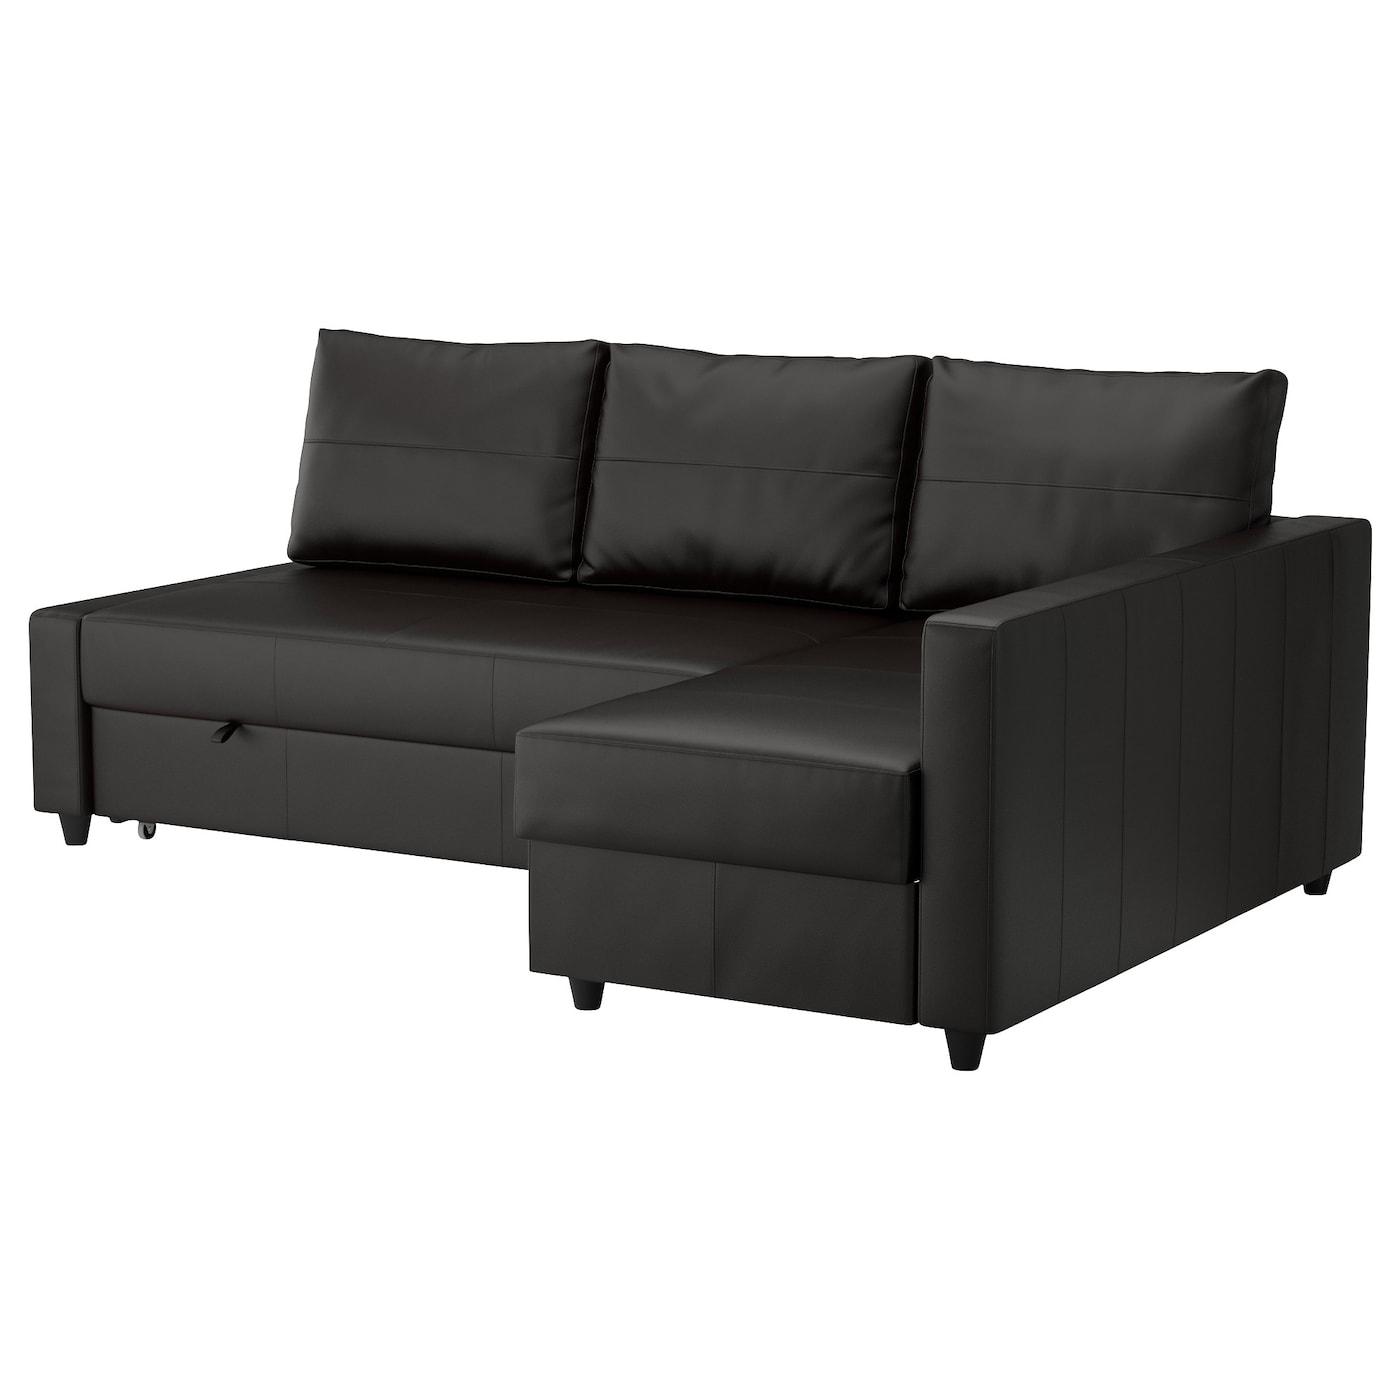 Friheten corner sofa bed with storage bomstad black ikea for Sofa with storage